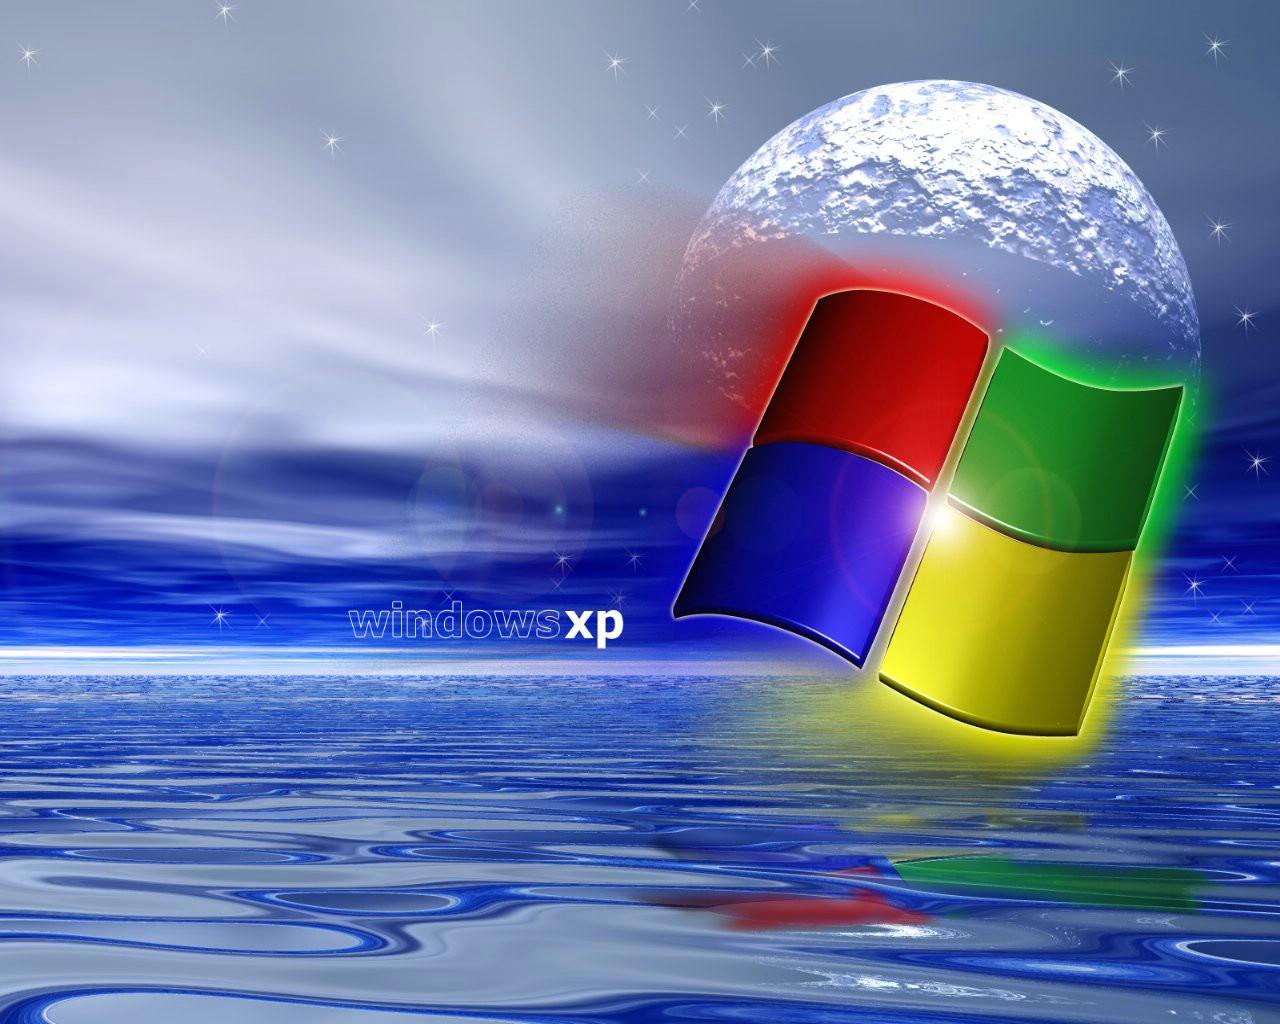 windows xp sp4 iso download